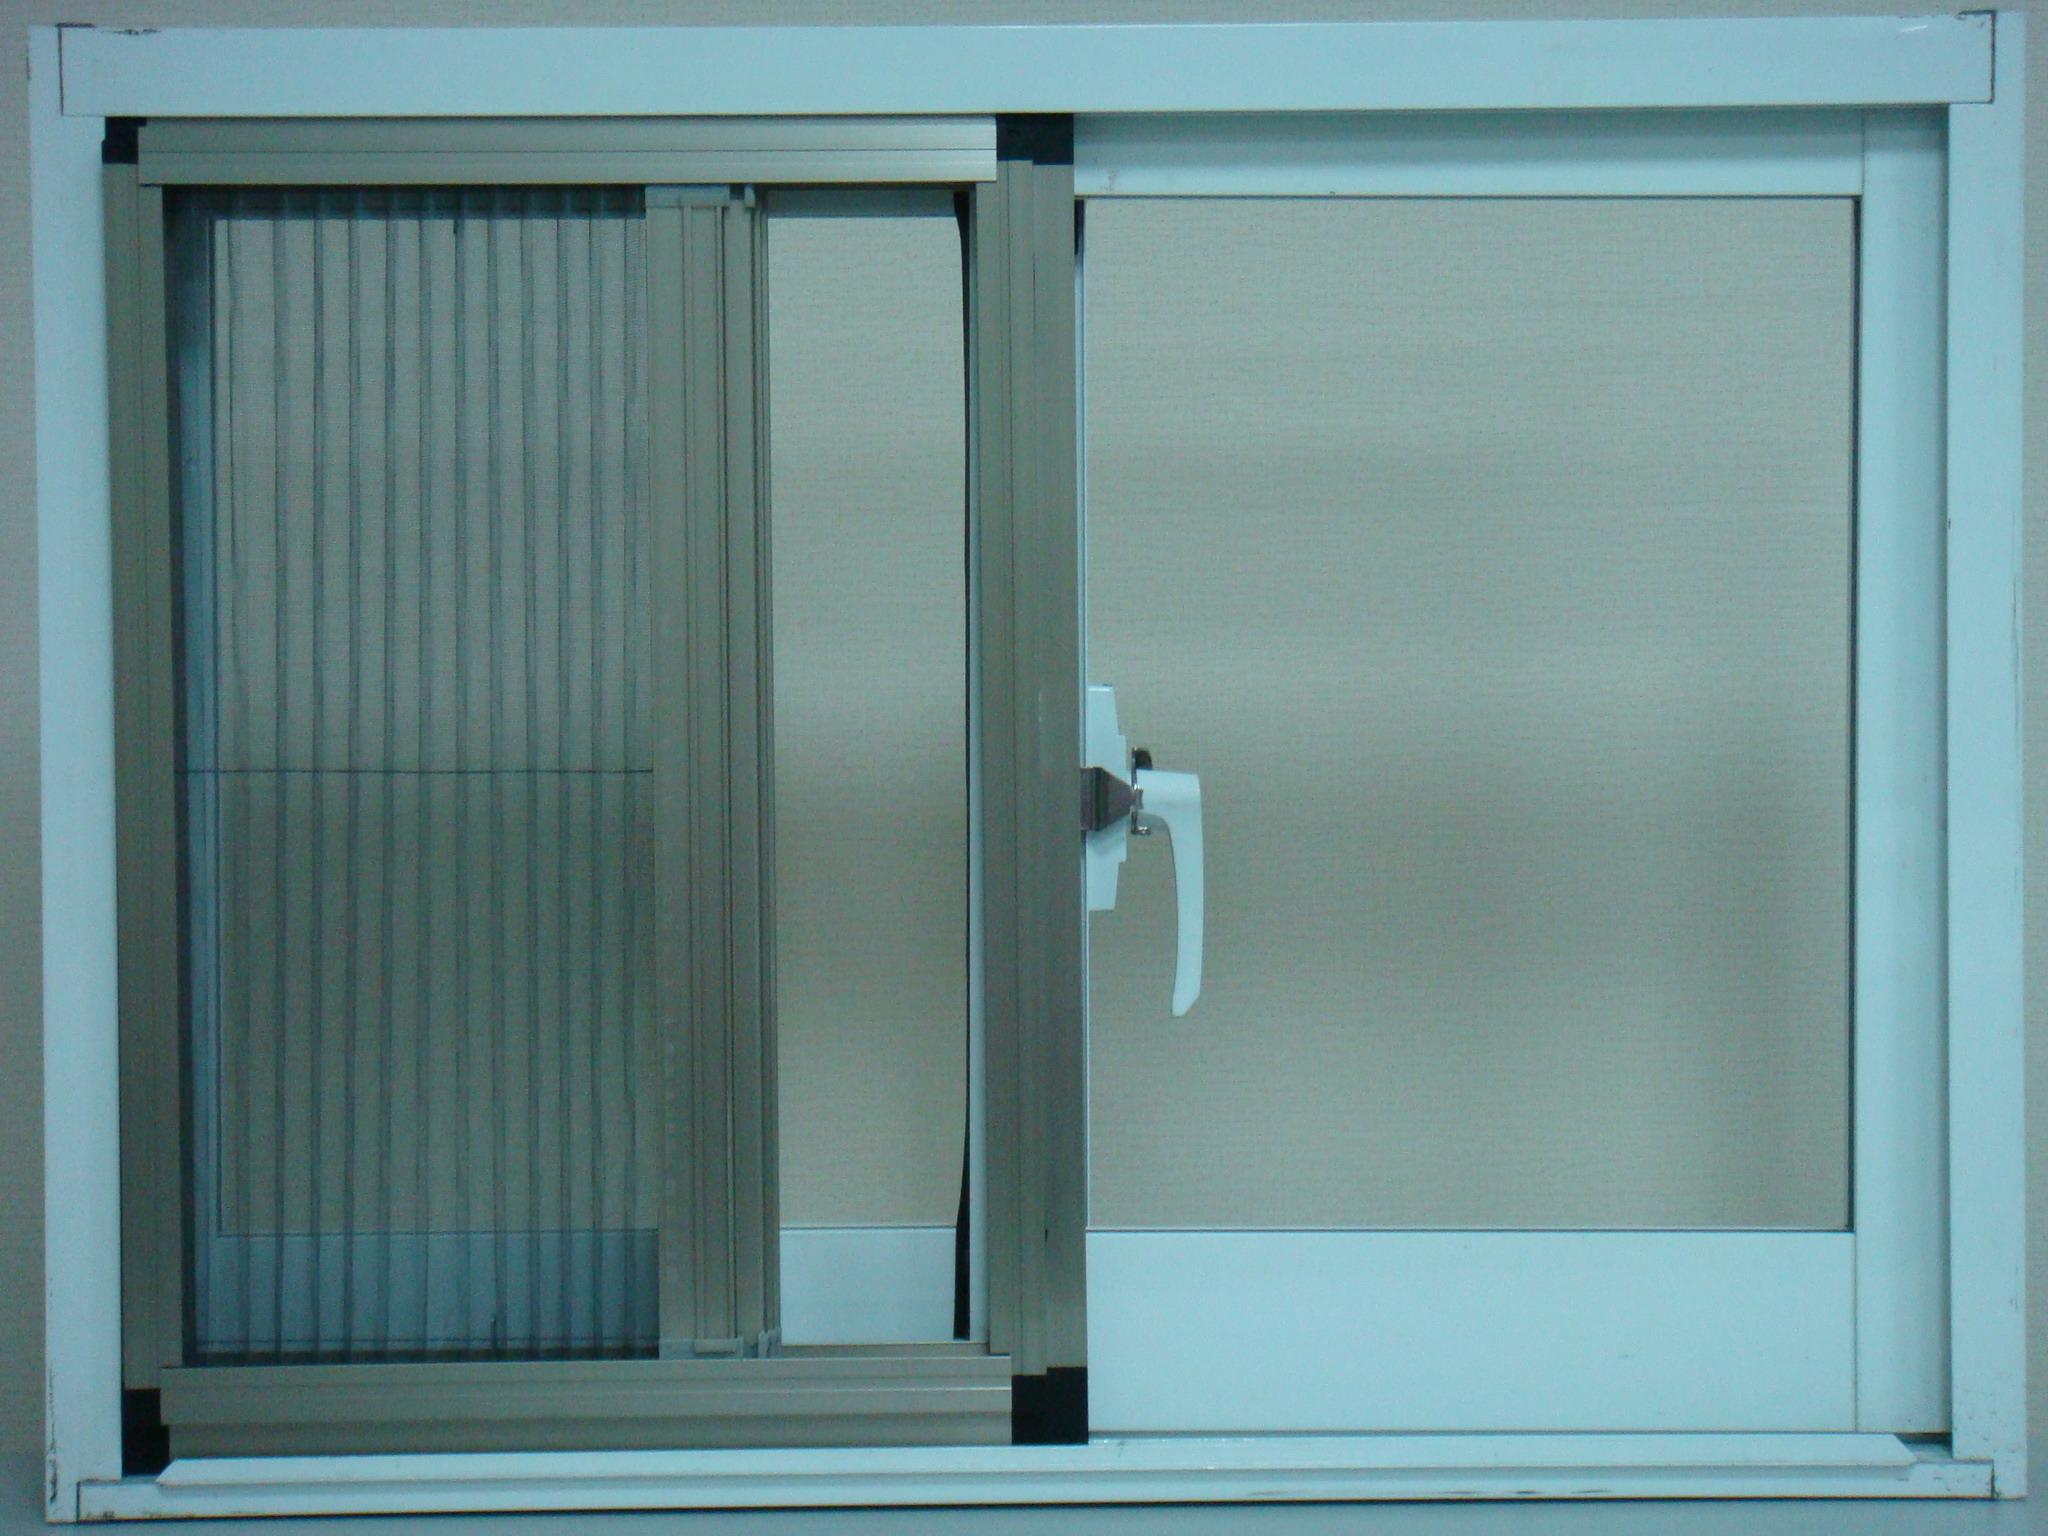 Traditional substitution / Taroko Door & Windows Technologies, Inc.